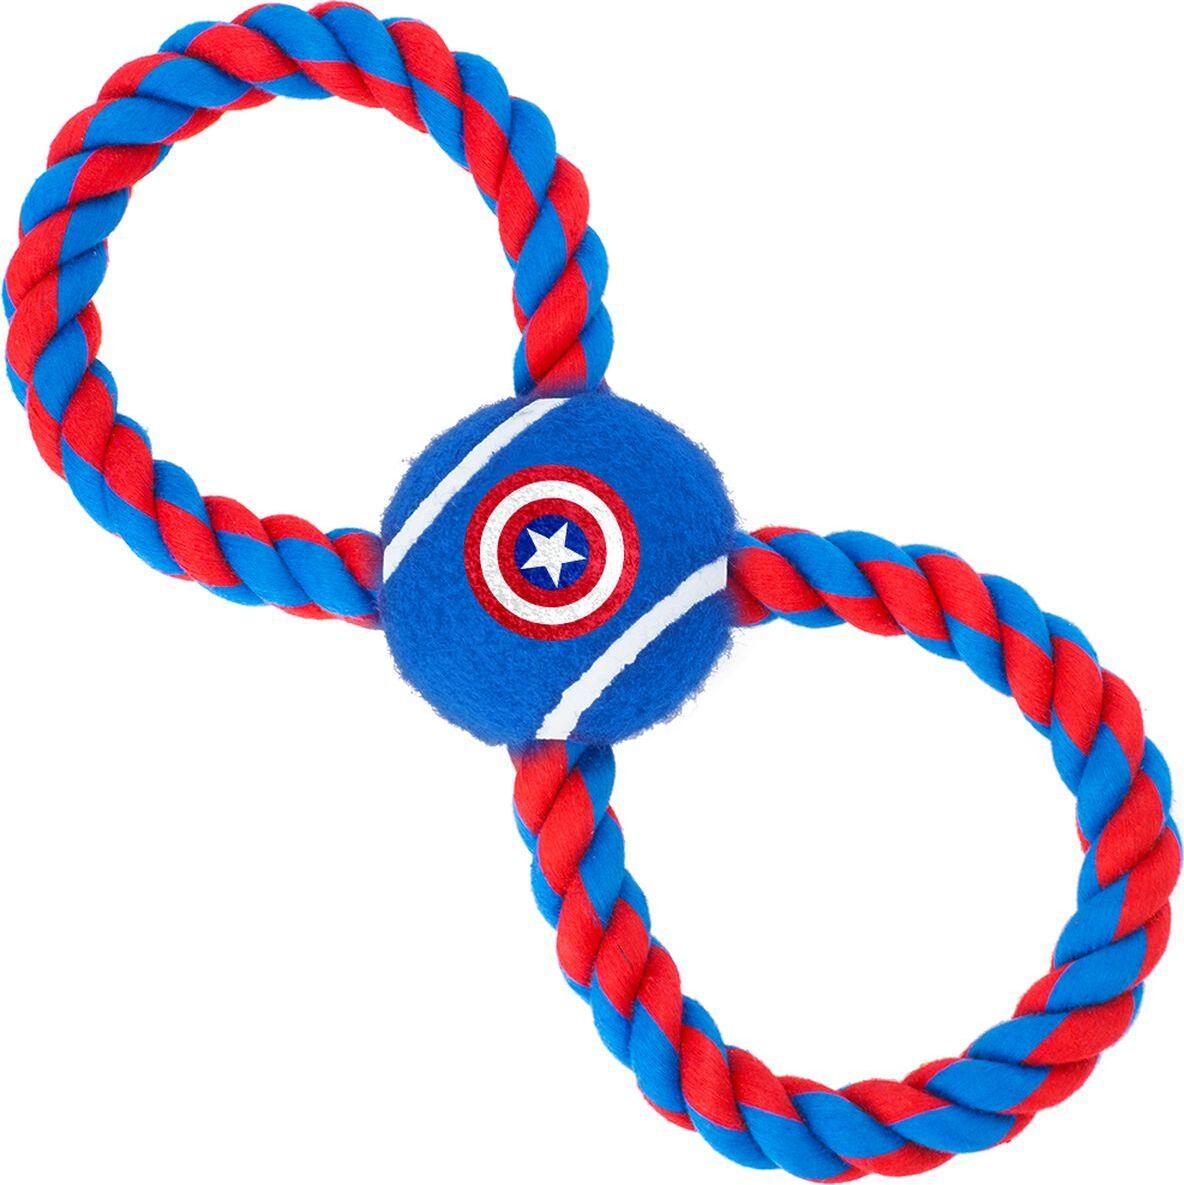 Грейфер для собак Buckle-Down Мячик на веревке Капитан Америка, длина 29 см фото